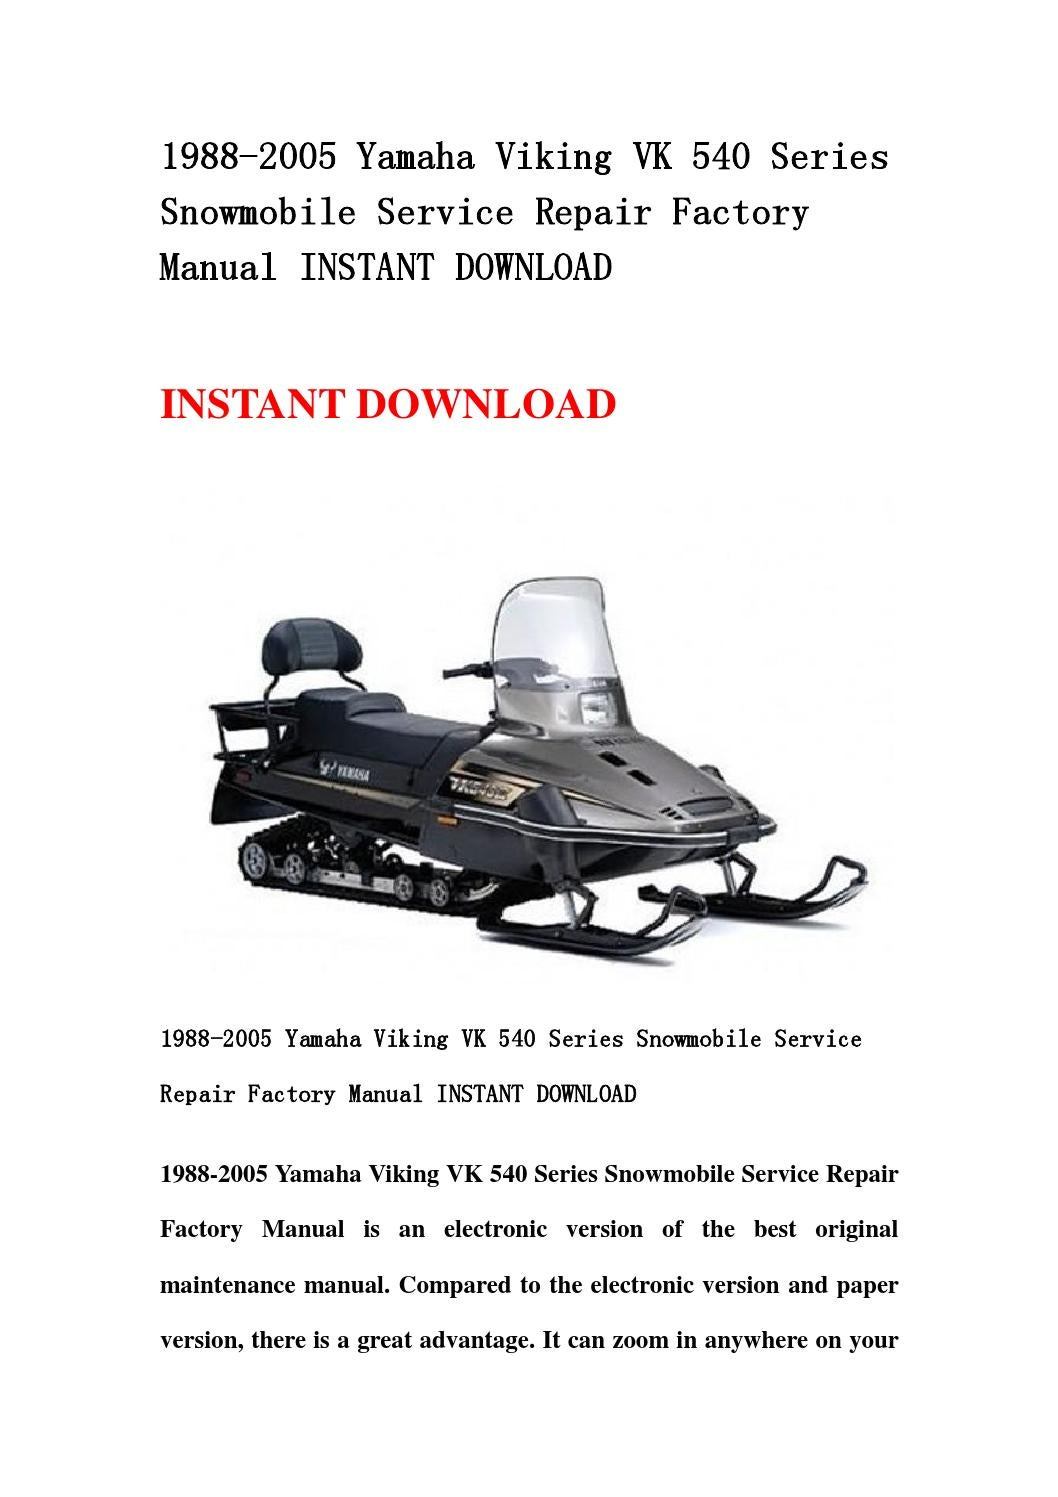 2019 Yamaha VK540 For Sale in Ronan, MT - Snowmobile Trader